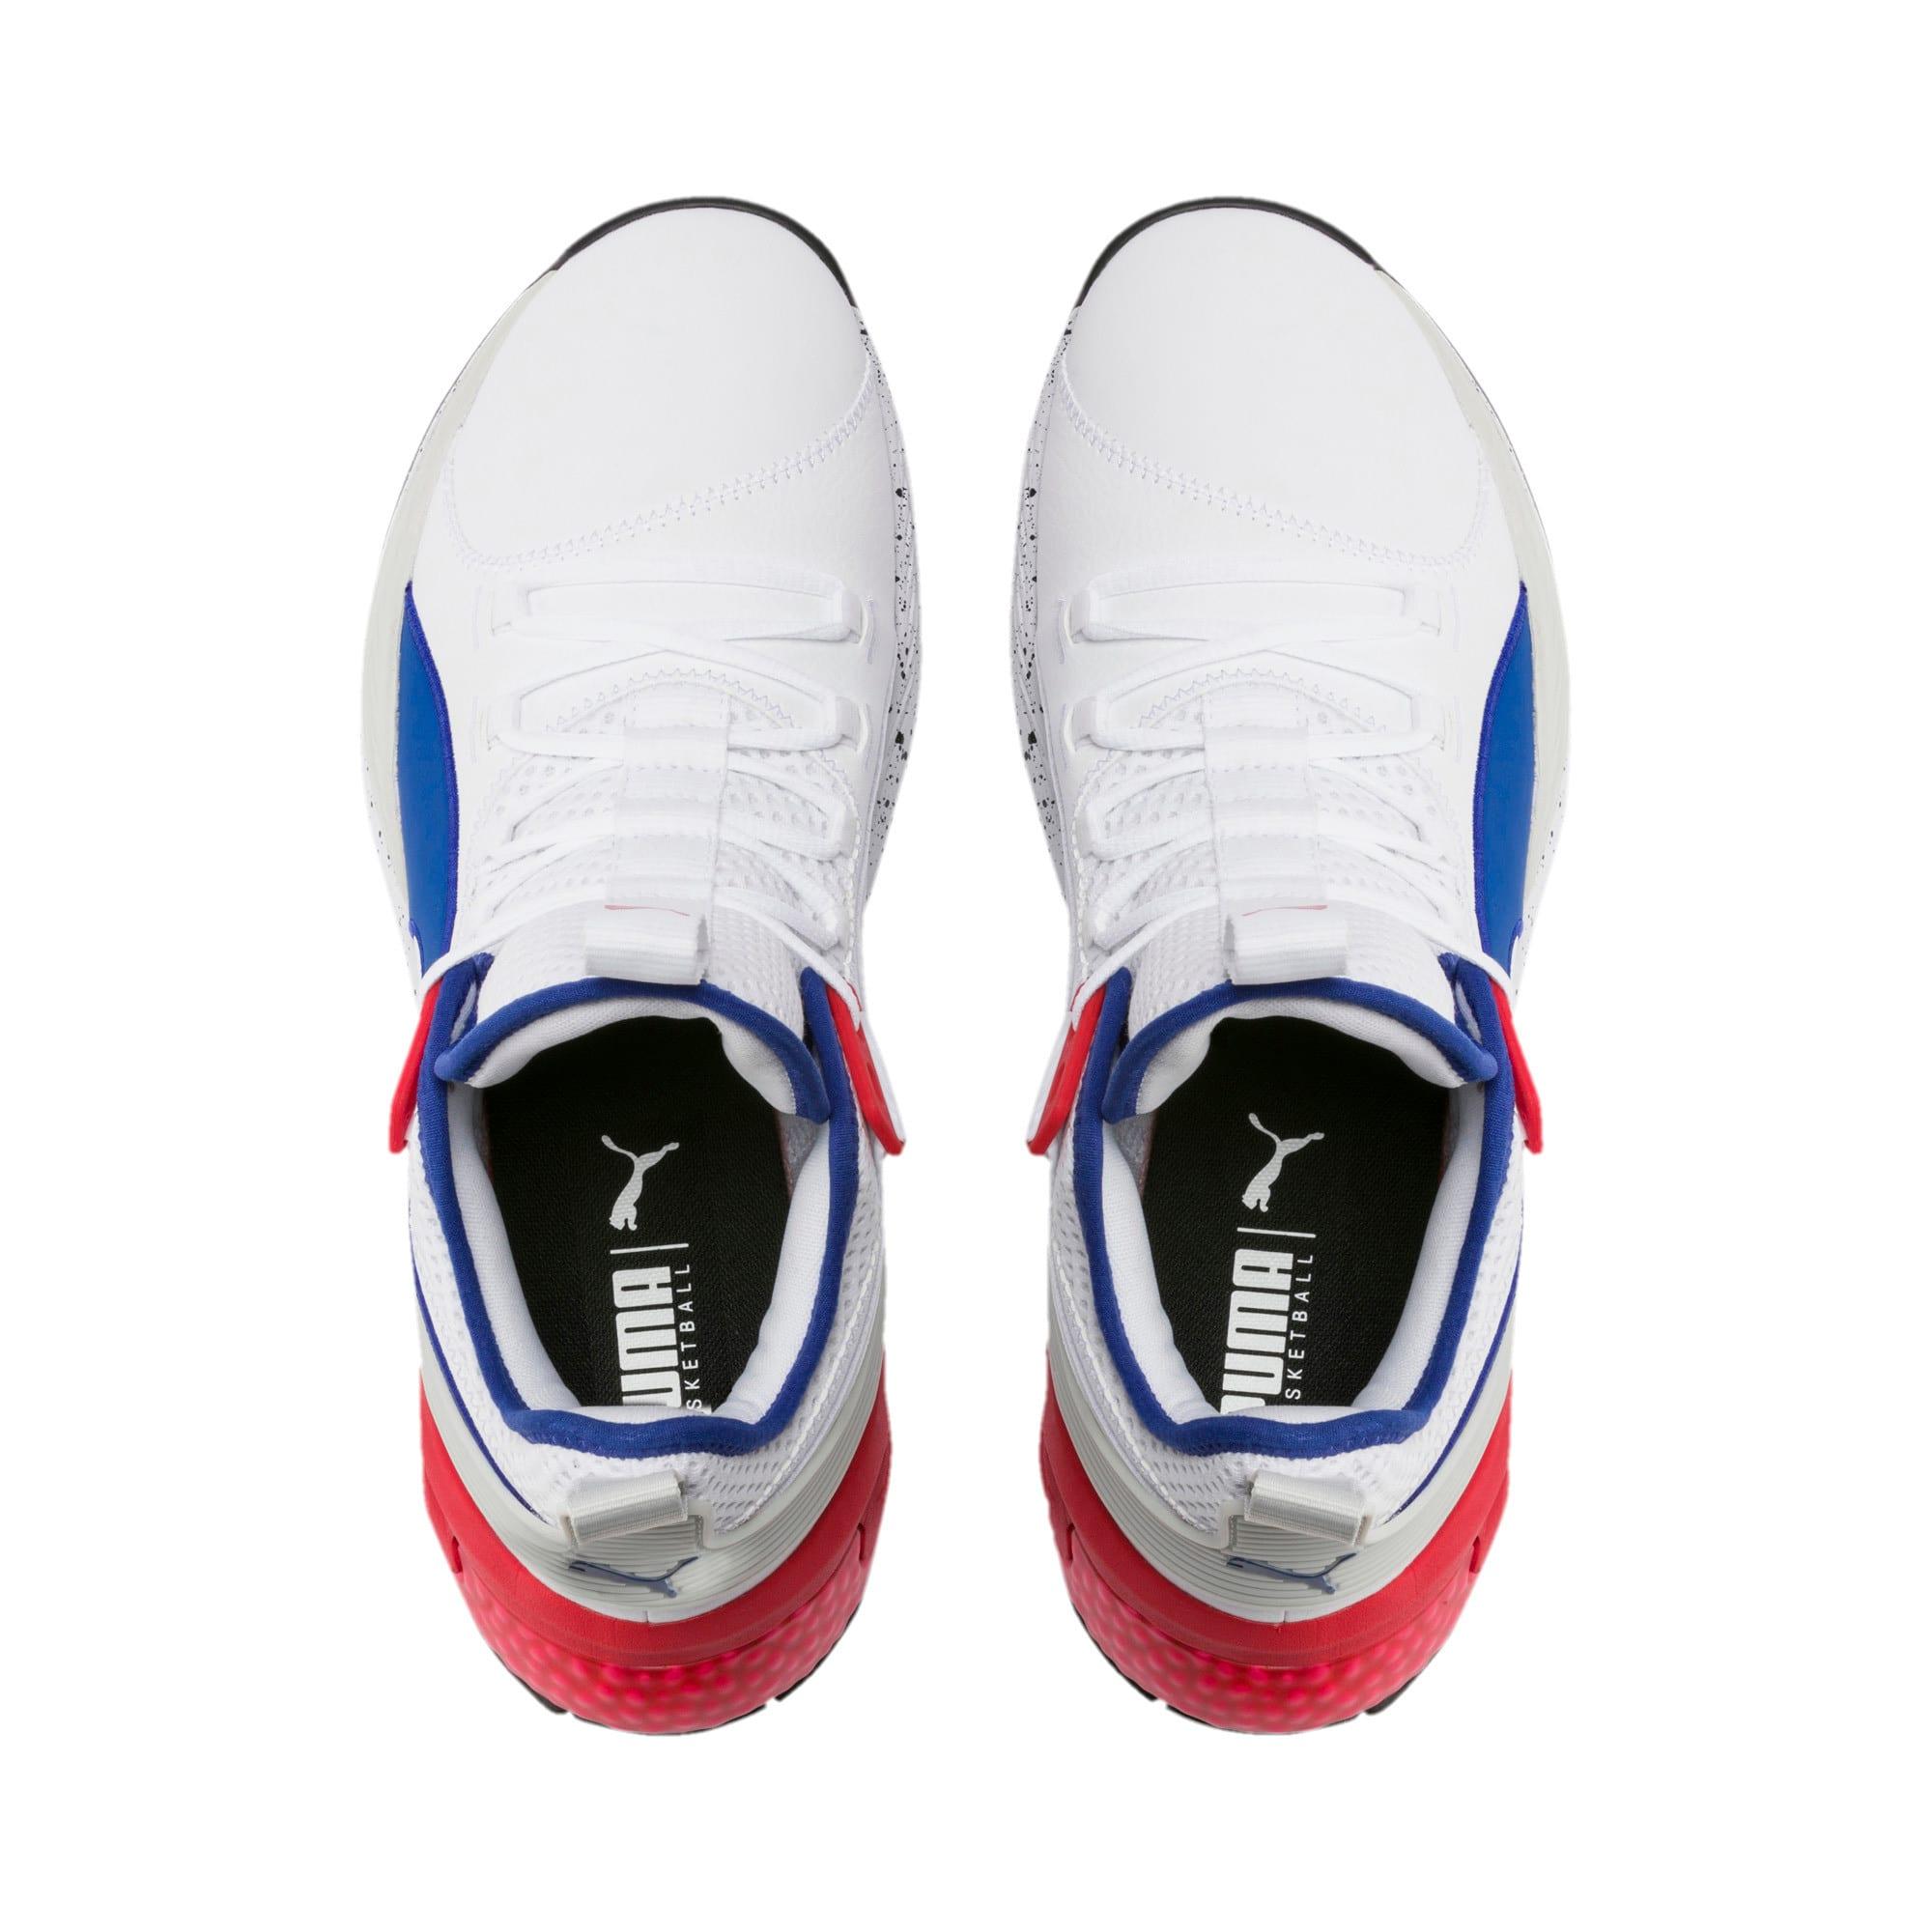 Thumbnail 6 of Uproar Palace Guard Basketball Shoes, Puma White-Surf The Web, medium